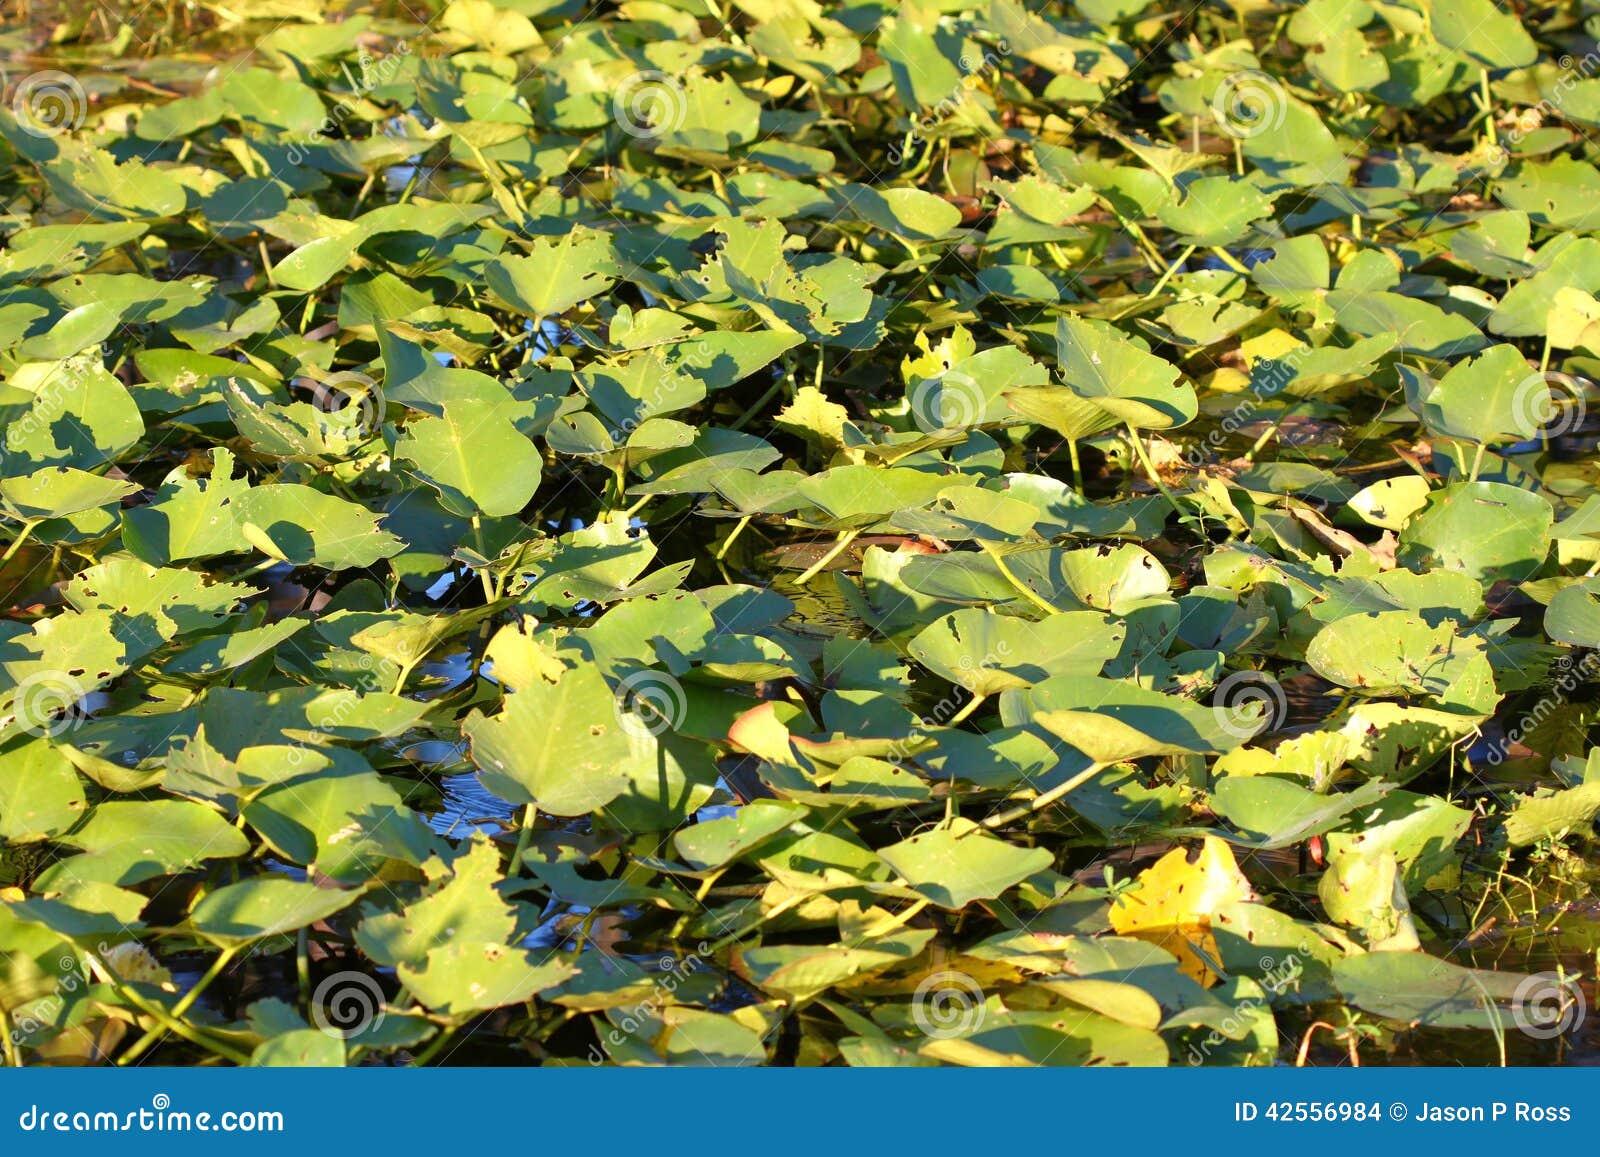 Wetland Vegetation in Florida